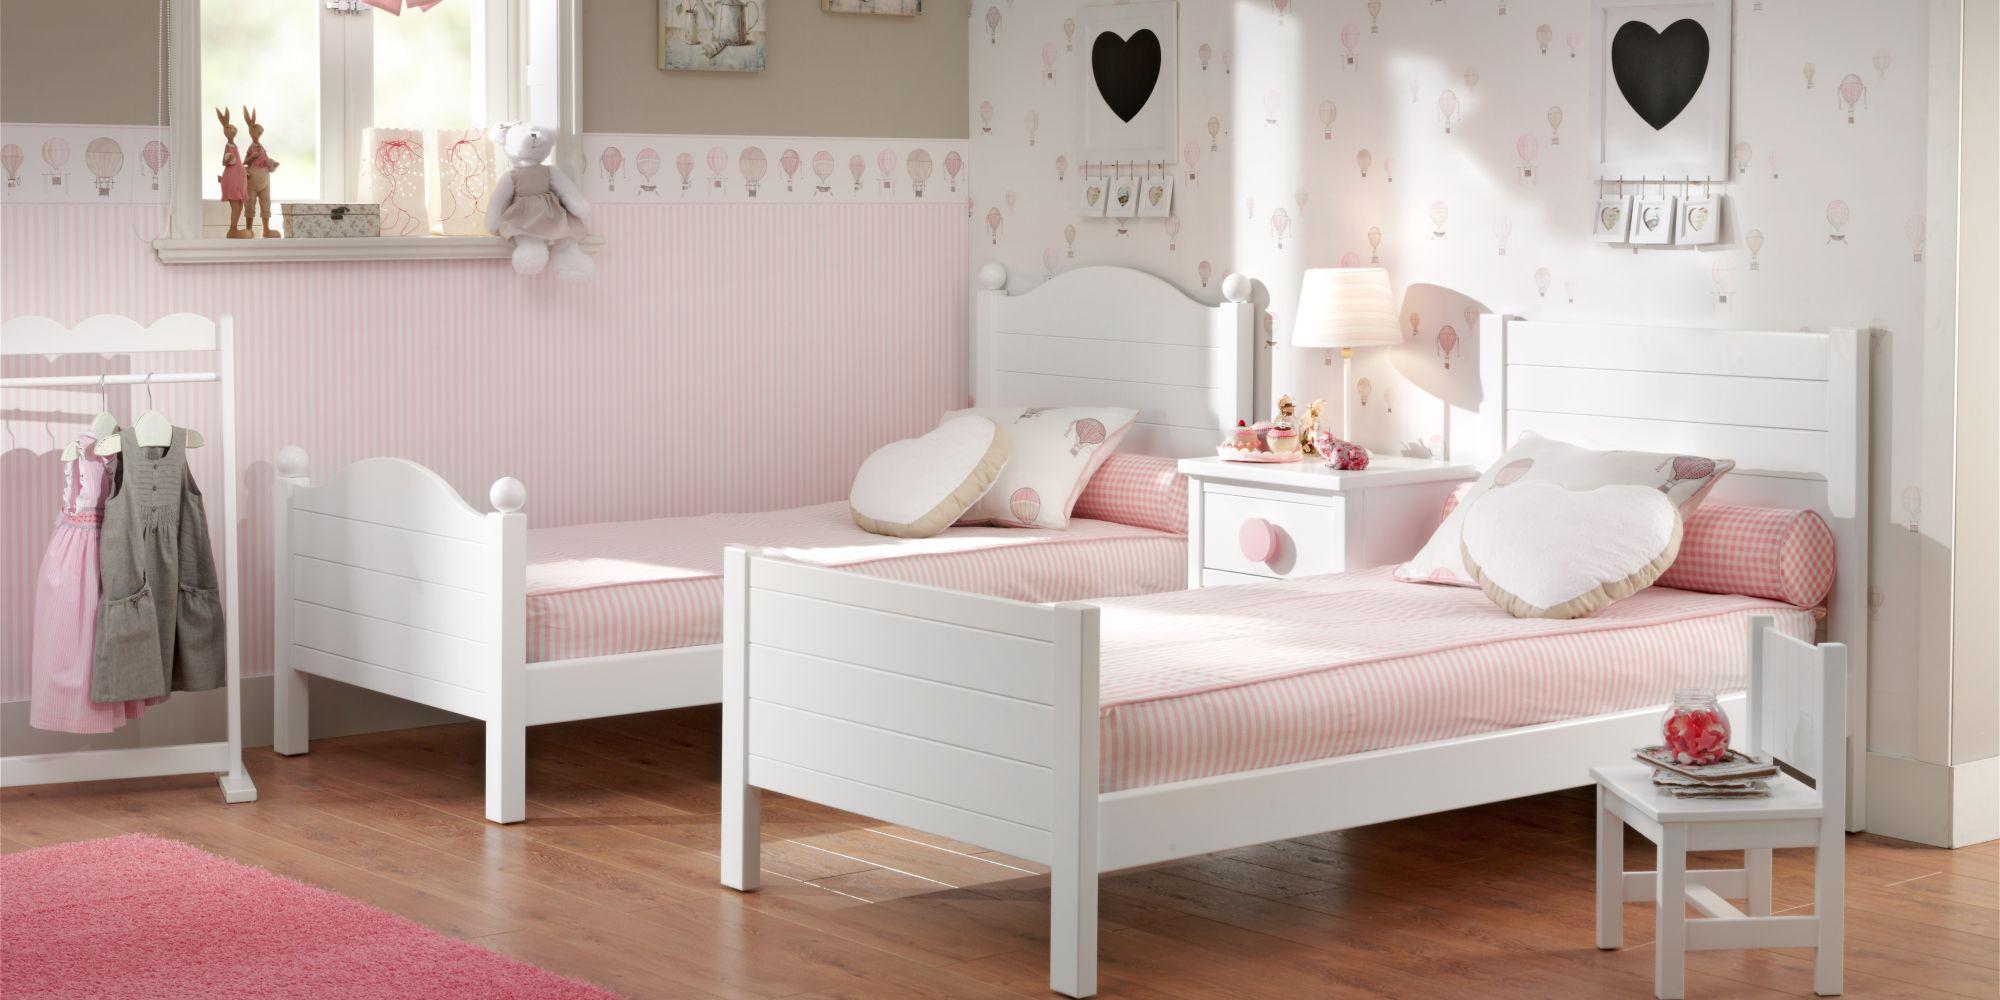 Cama individual, ideal para habitación infantil | Mueble Infantil